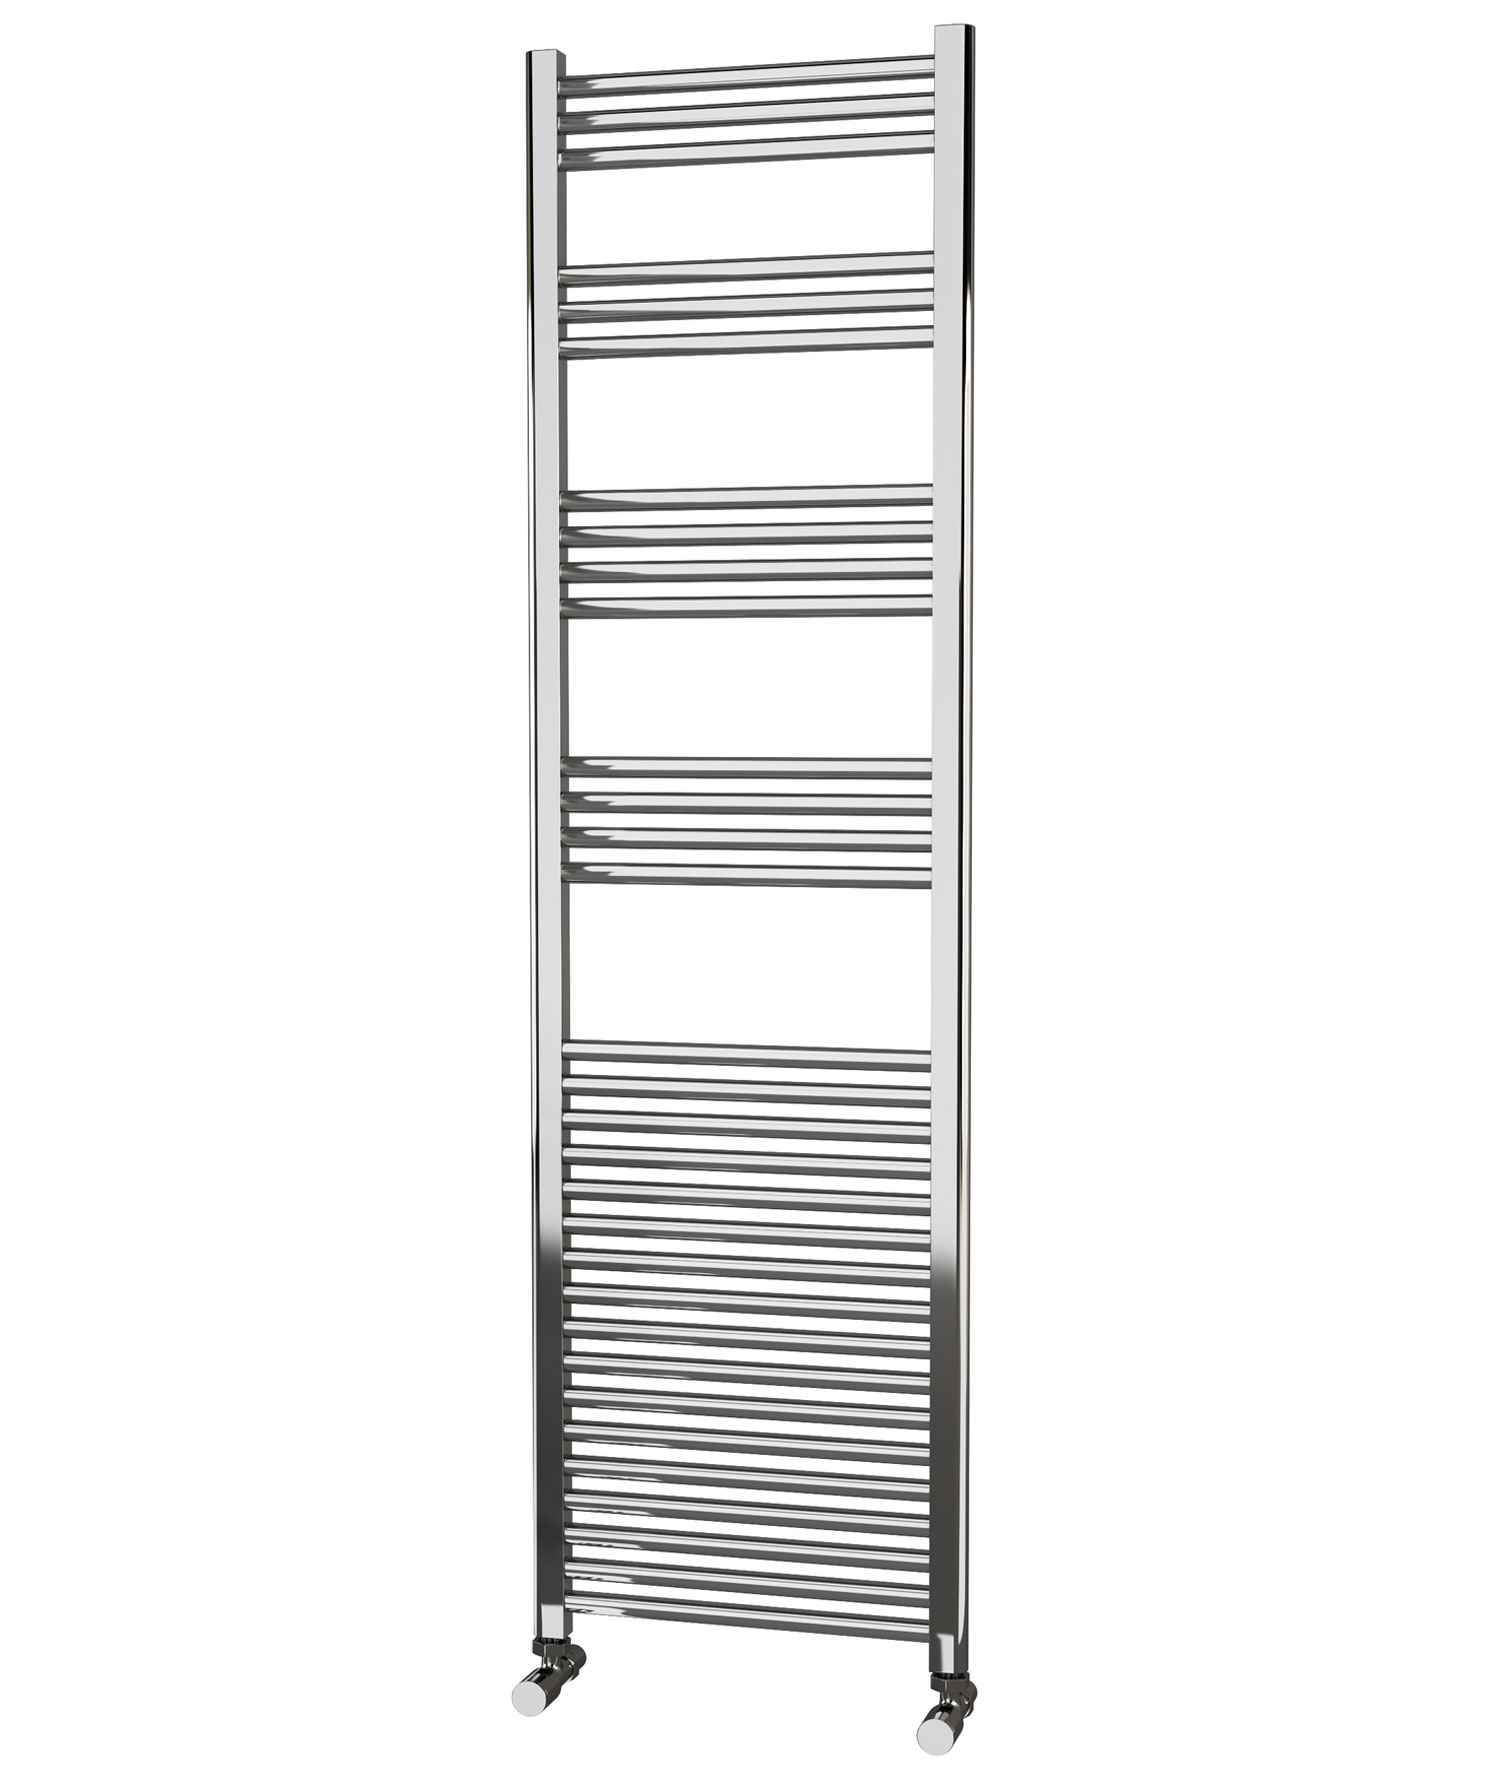 650x400mm Electric Straight Heated Towel Rail: Eastgate Straight Chrome Heated Towel Rail 1800mm High X